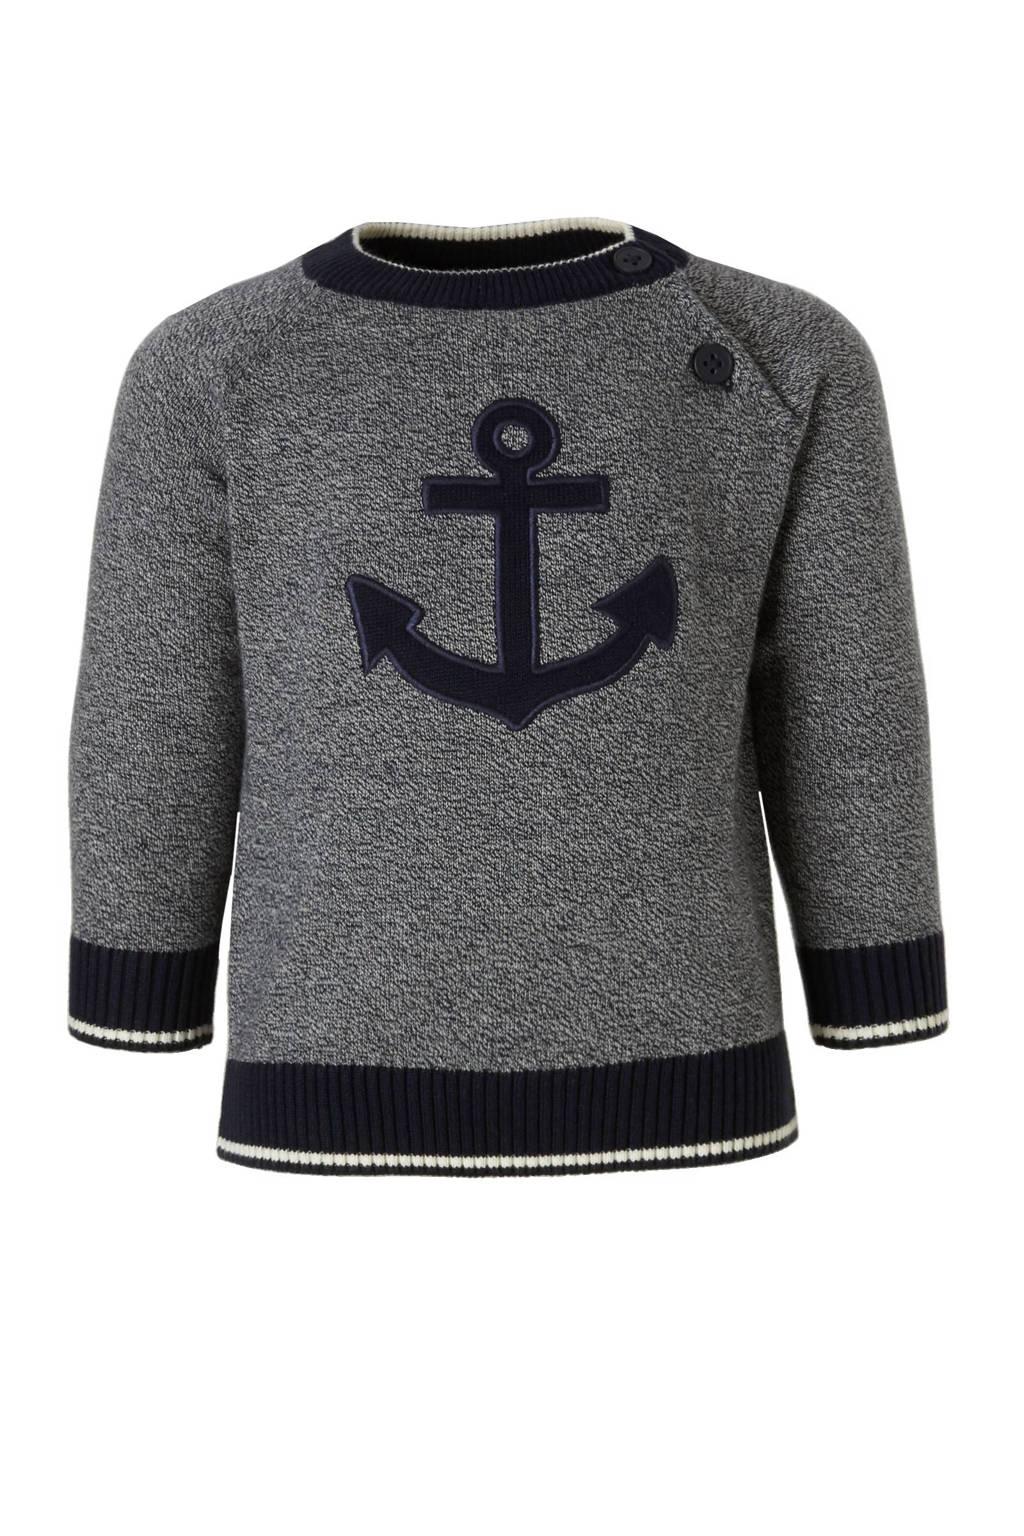 C&A Baby Club trui, Donkerblauw